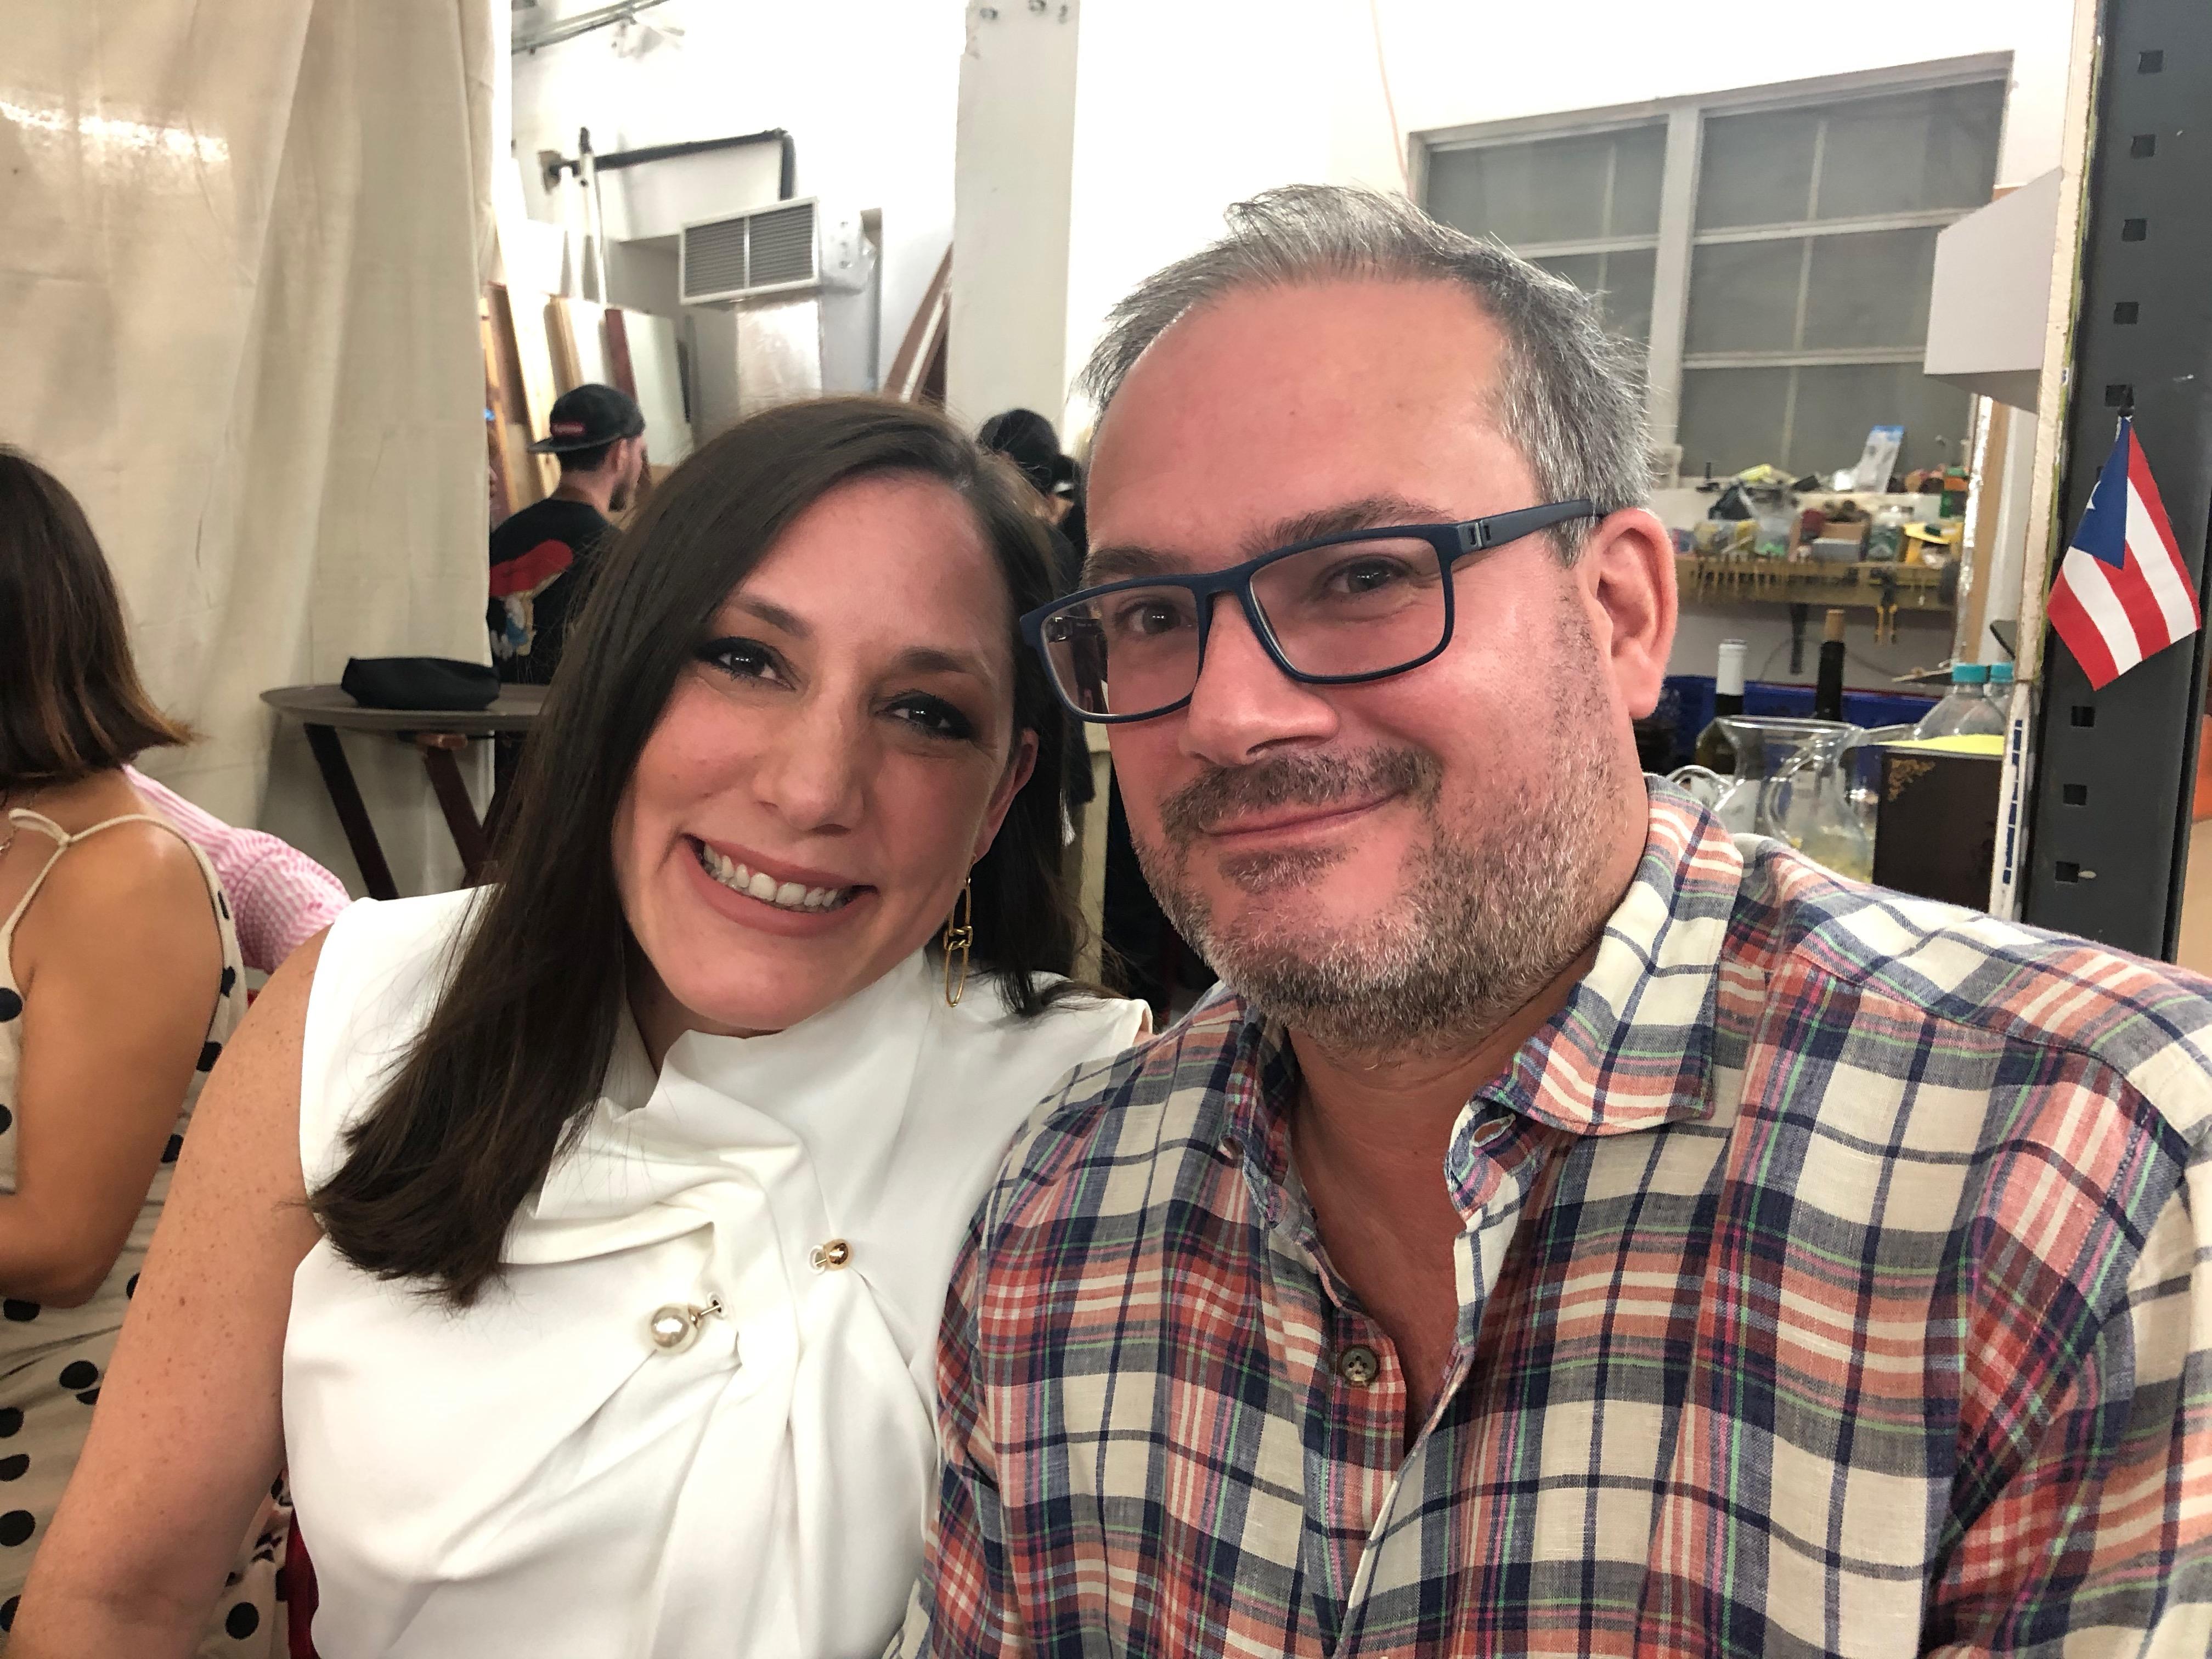 Eduardo Medina y Sara Alvarez. Foto suministrada